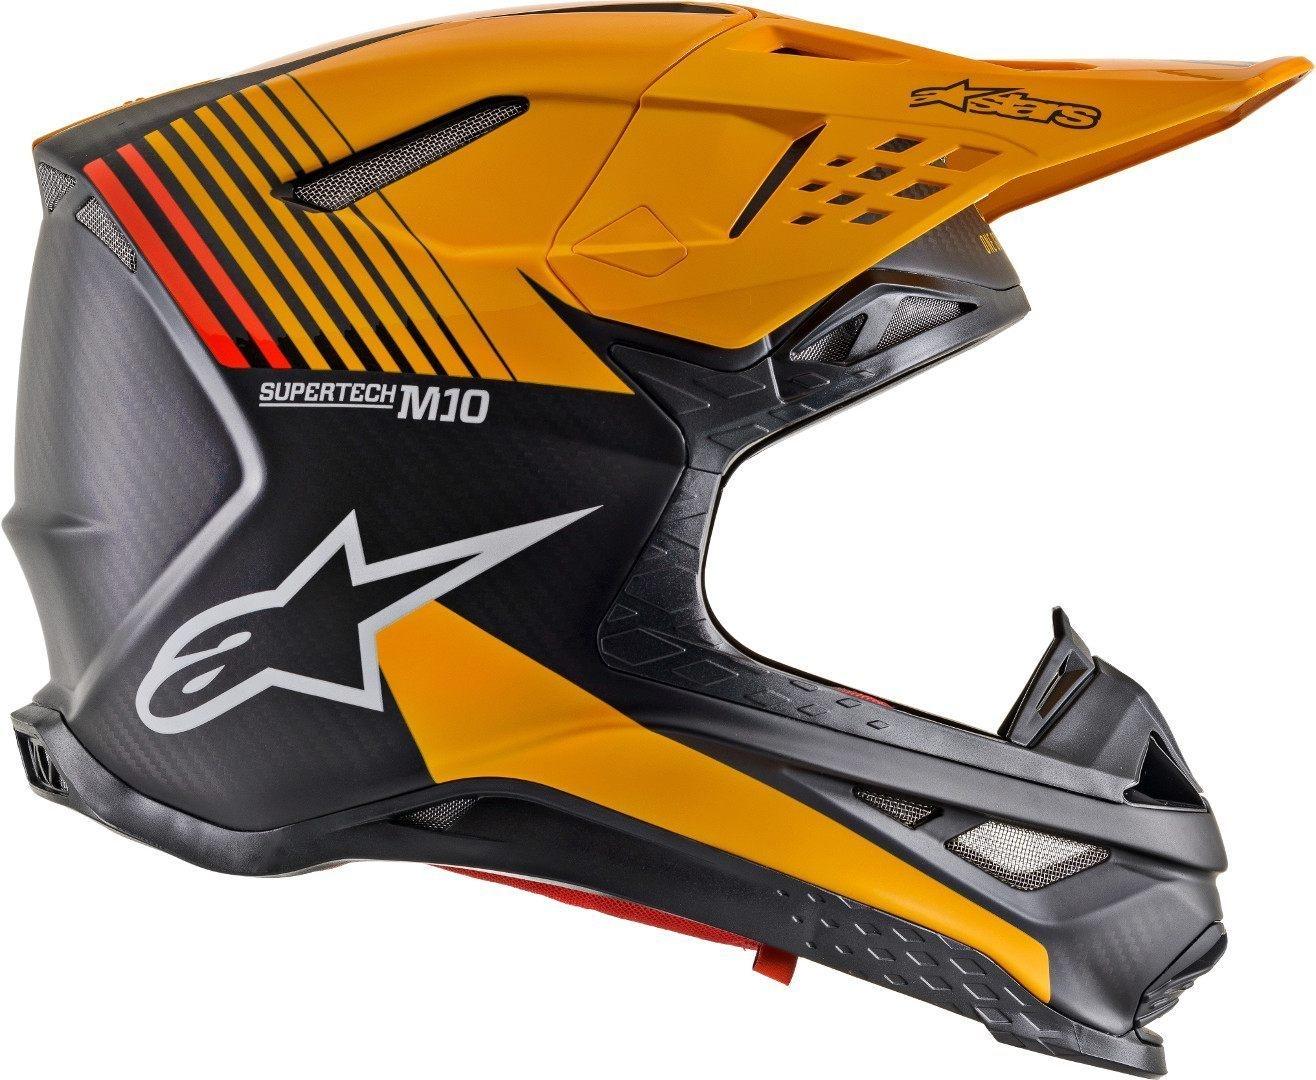 Casco cross alpinestars SUPERTECH S-M10 DYNO Black Carbon Orange M&G 2